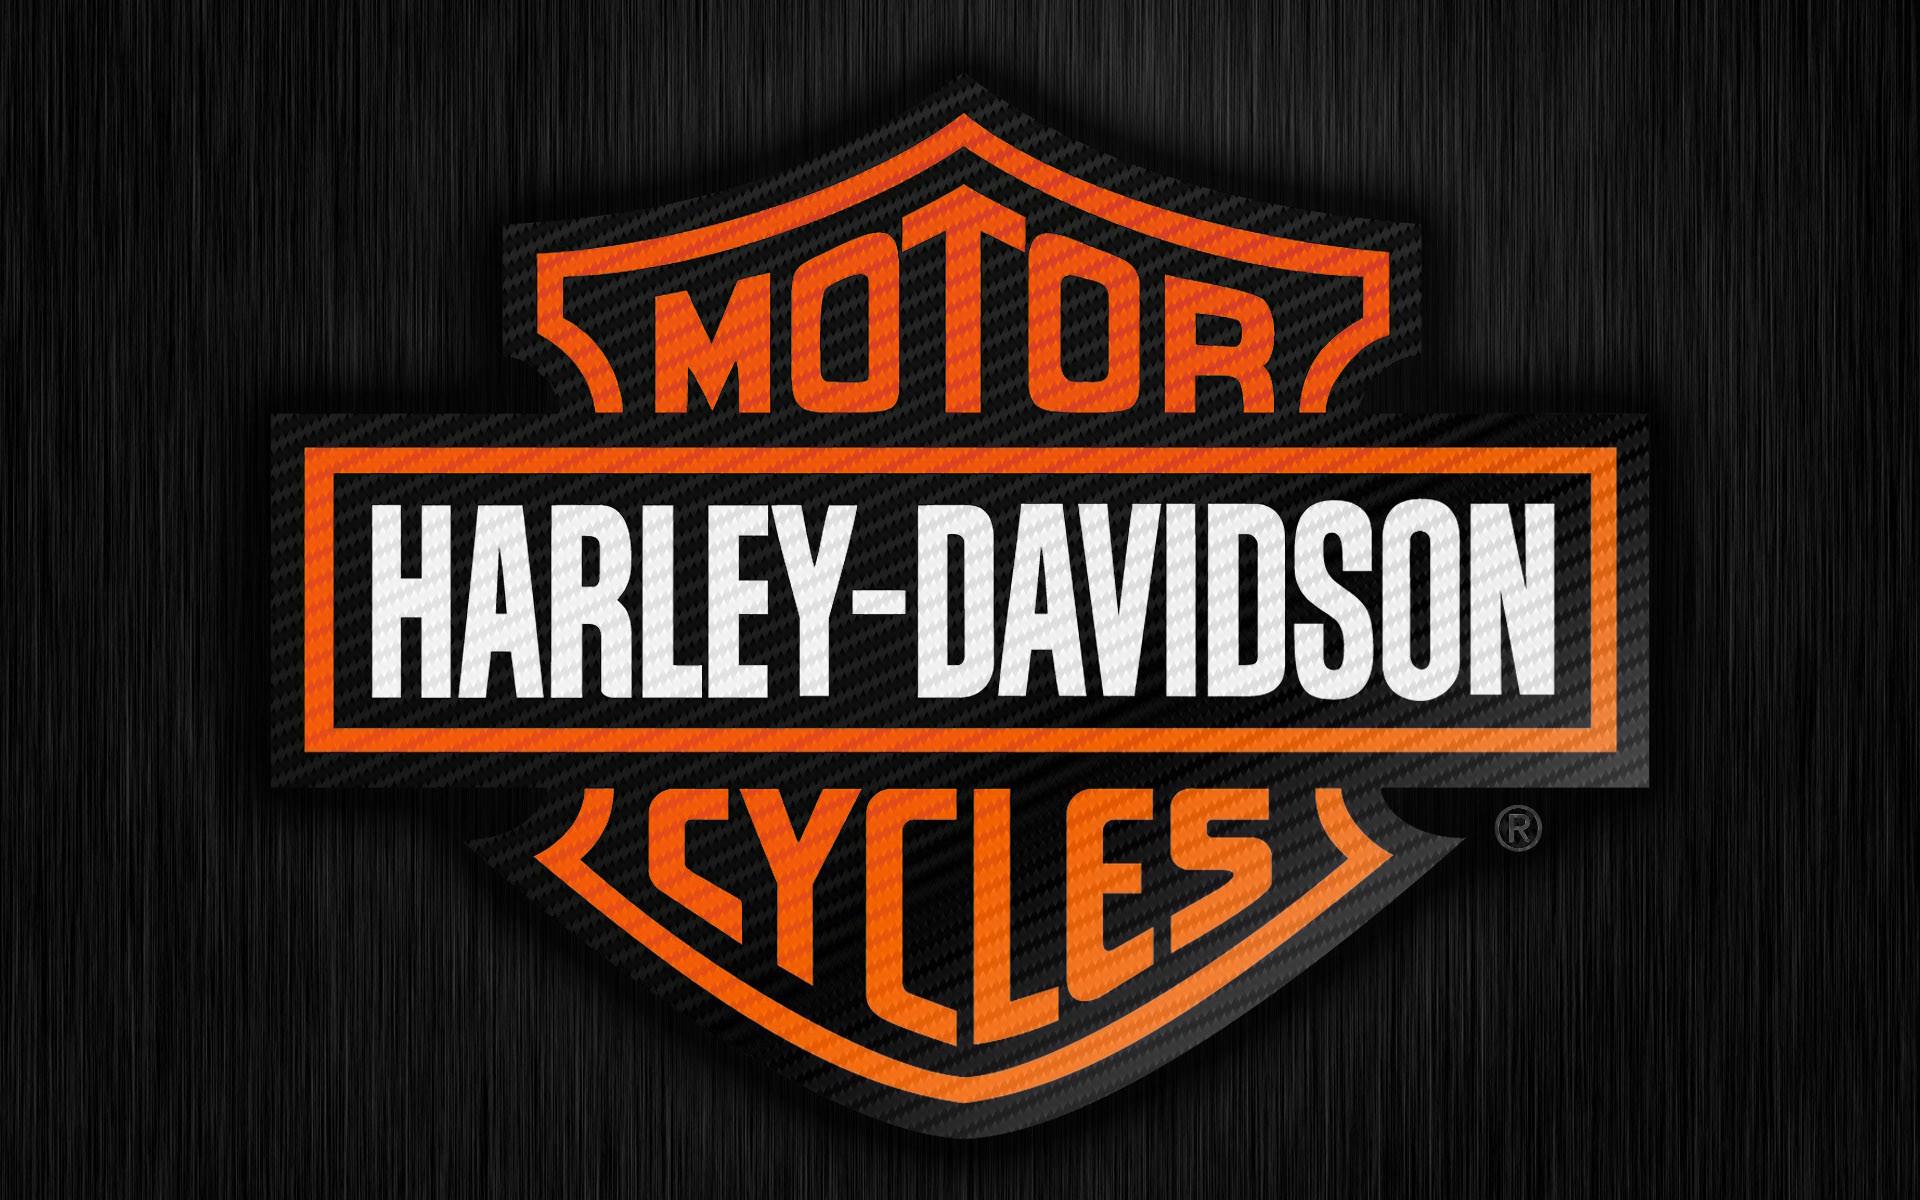 Related Wallpapers from Cincinnati Reds Wallpaper. Harley Davidson Logo  Wallpaper